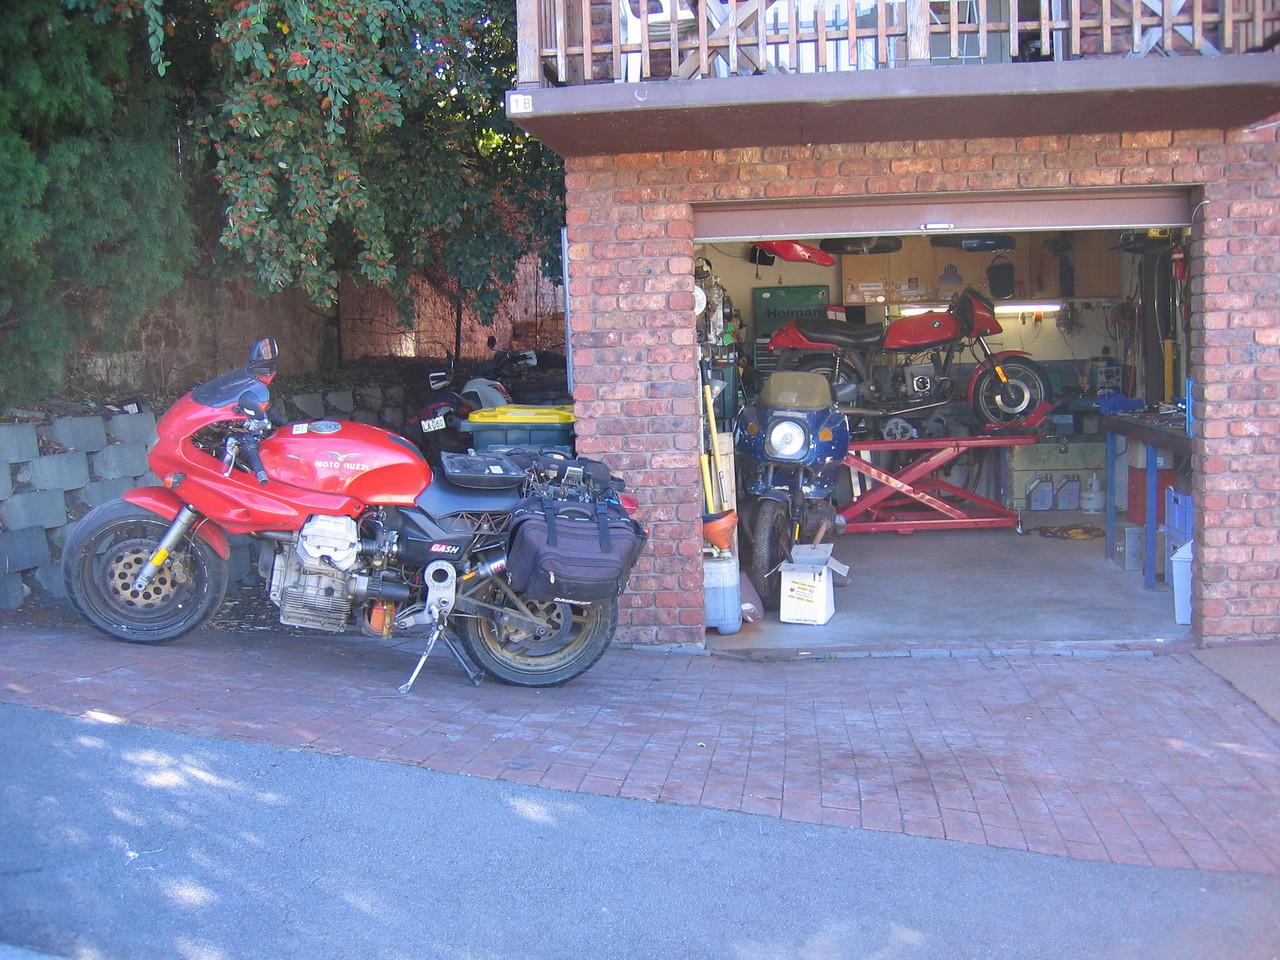 Four bike, only the Moto Guzzi goes, sigh